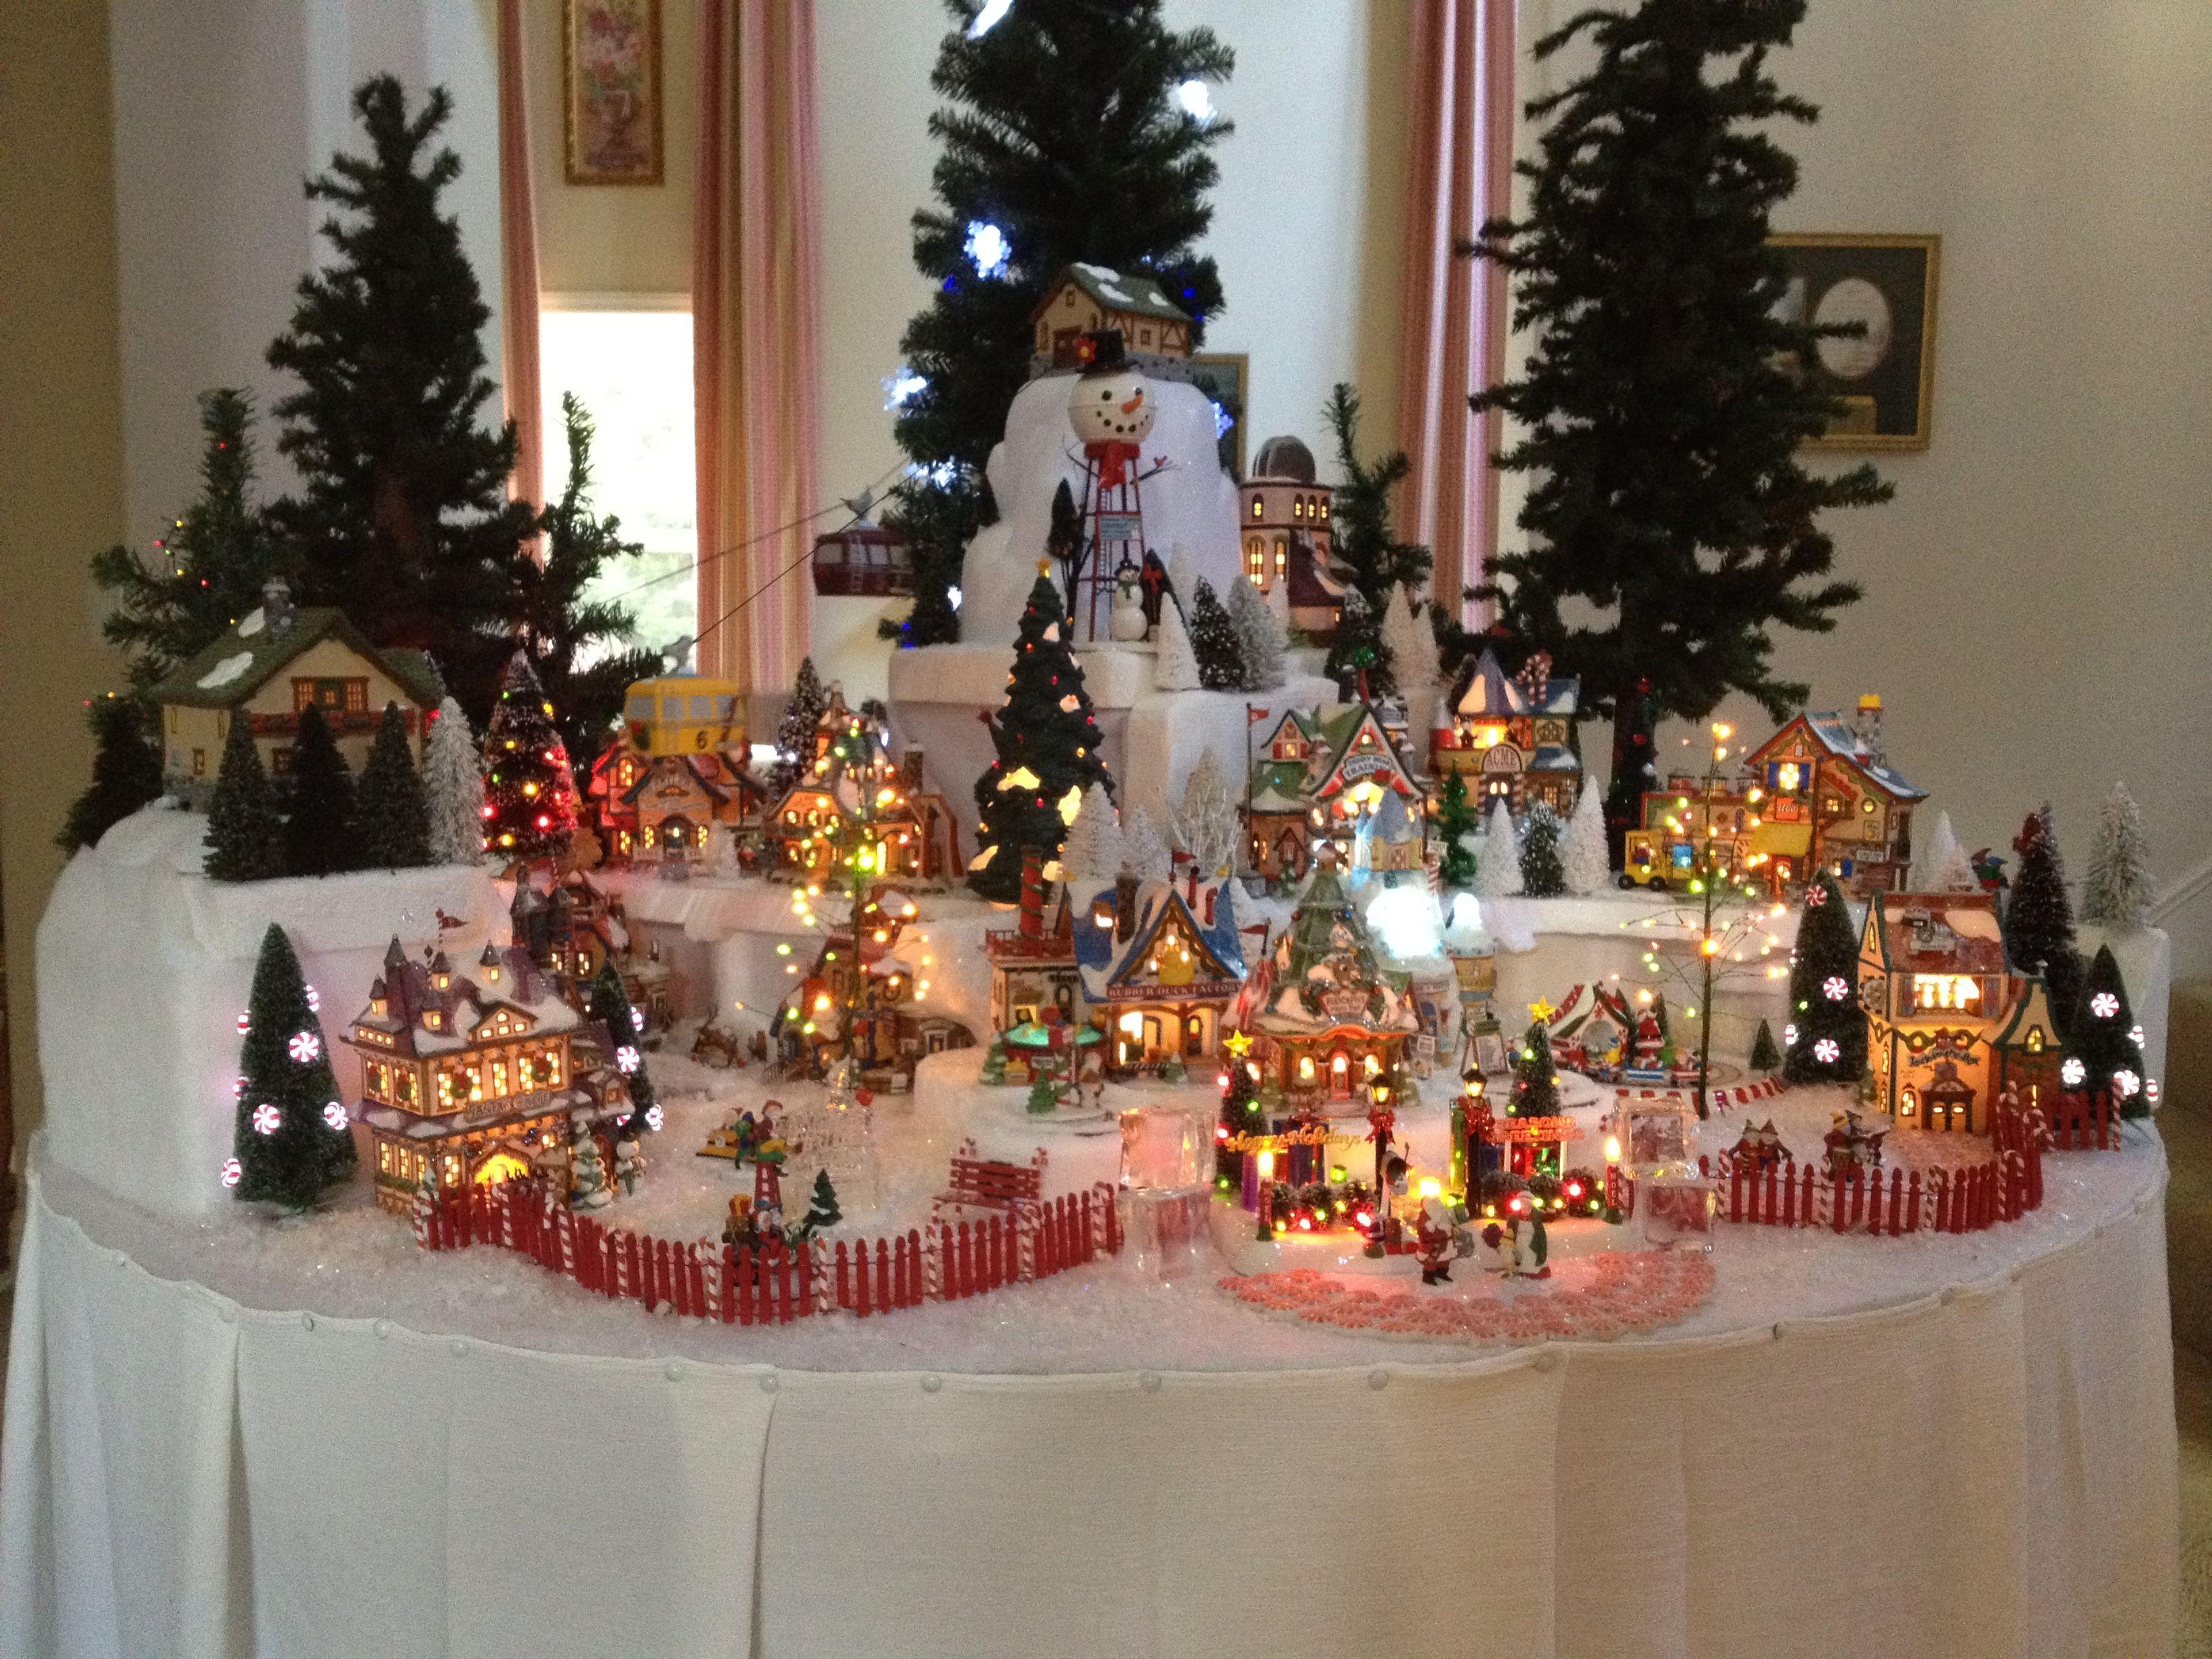 North pole village department 56 pinterest north pole christmas villages and department 56 - Decor village noel miniature ...